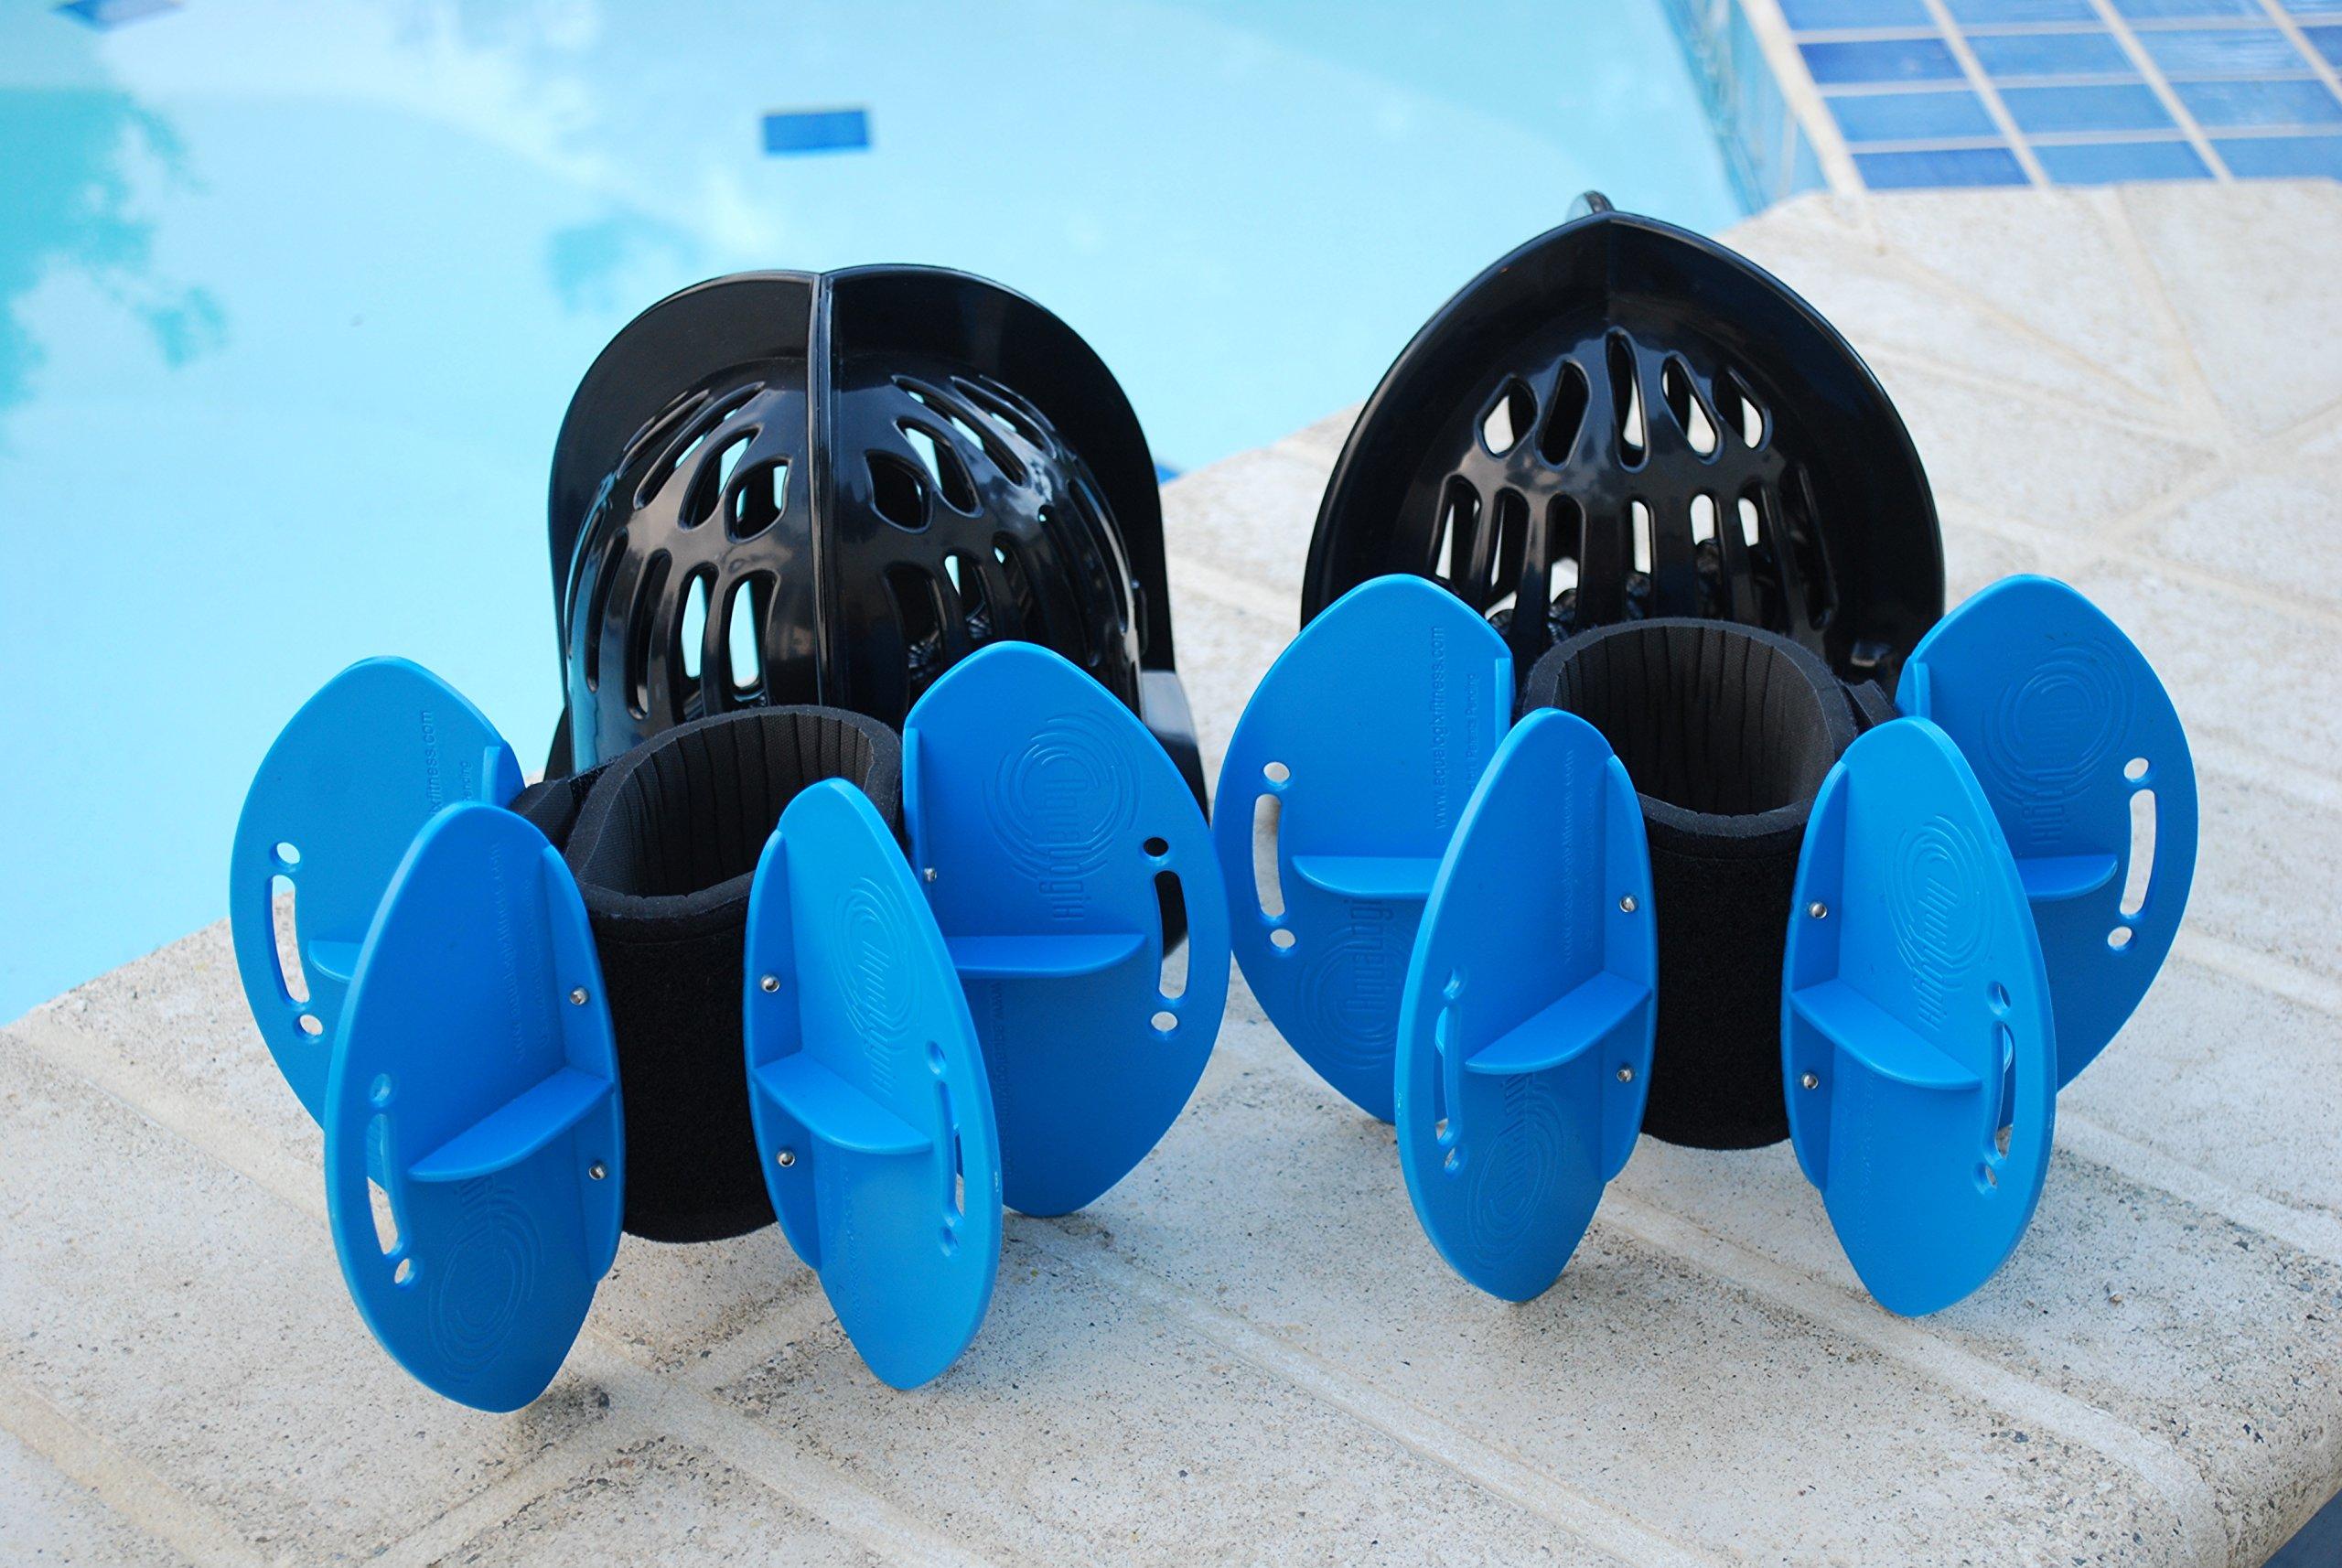 AquaLogix Total Body Aquatic Exercise System - Includes Online Demonstration Video (All Purpose Black Bells/Maximum Resistance Blue Fins) by AquaLogix